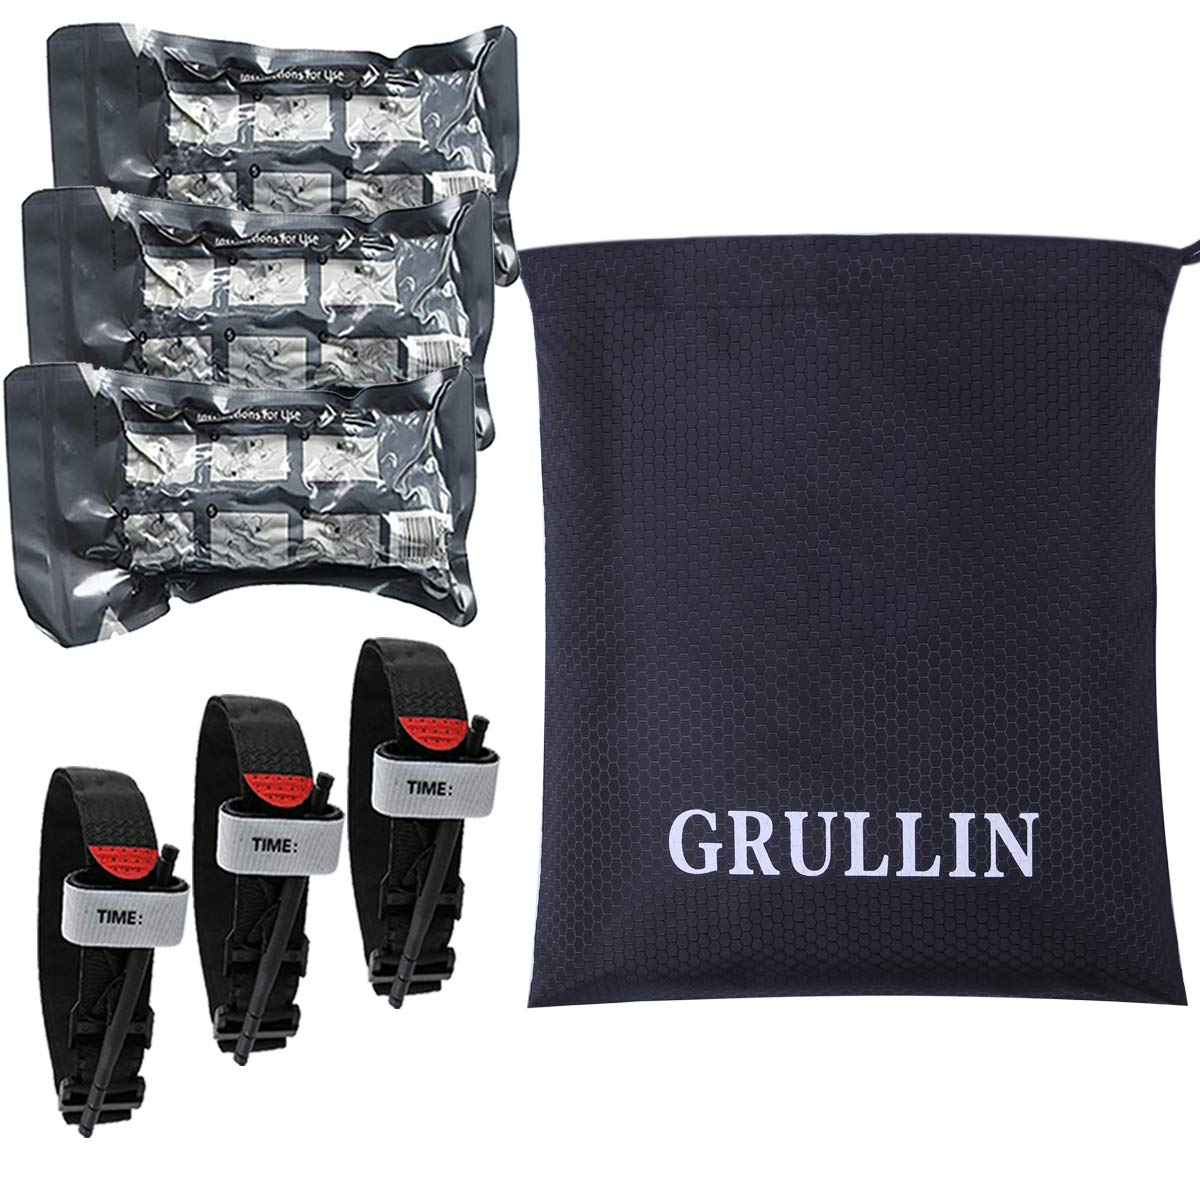 Sala GRULLIN Kits de Primeros Auxilios port/átiles Vendaje israel/í Torniquete autom/óvil Pr/ácticos Kits de Supervivencia Profesional para Exteriores